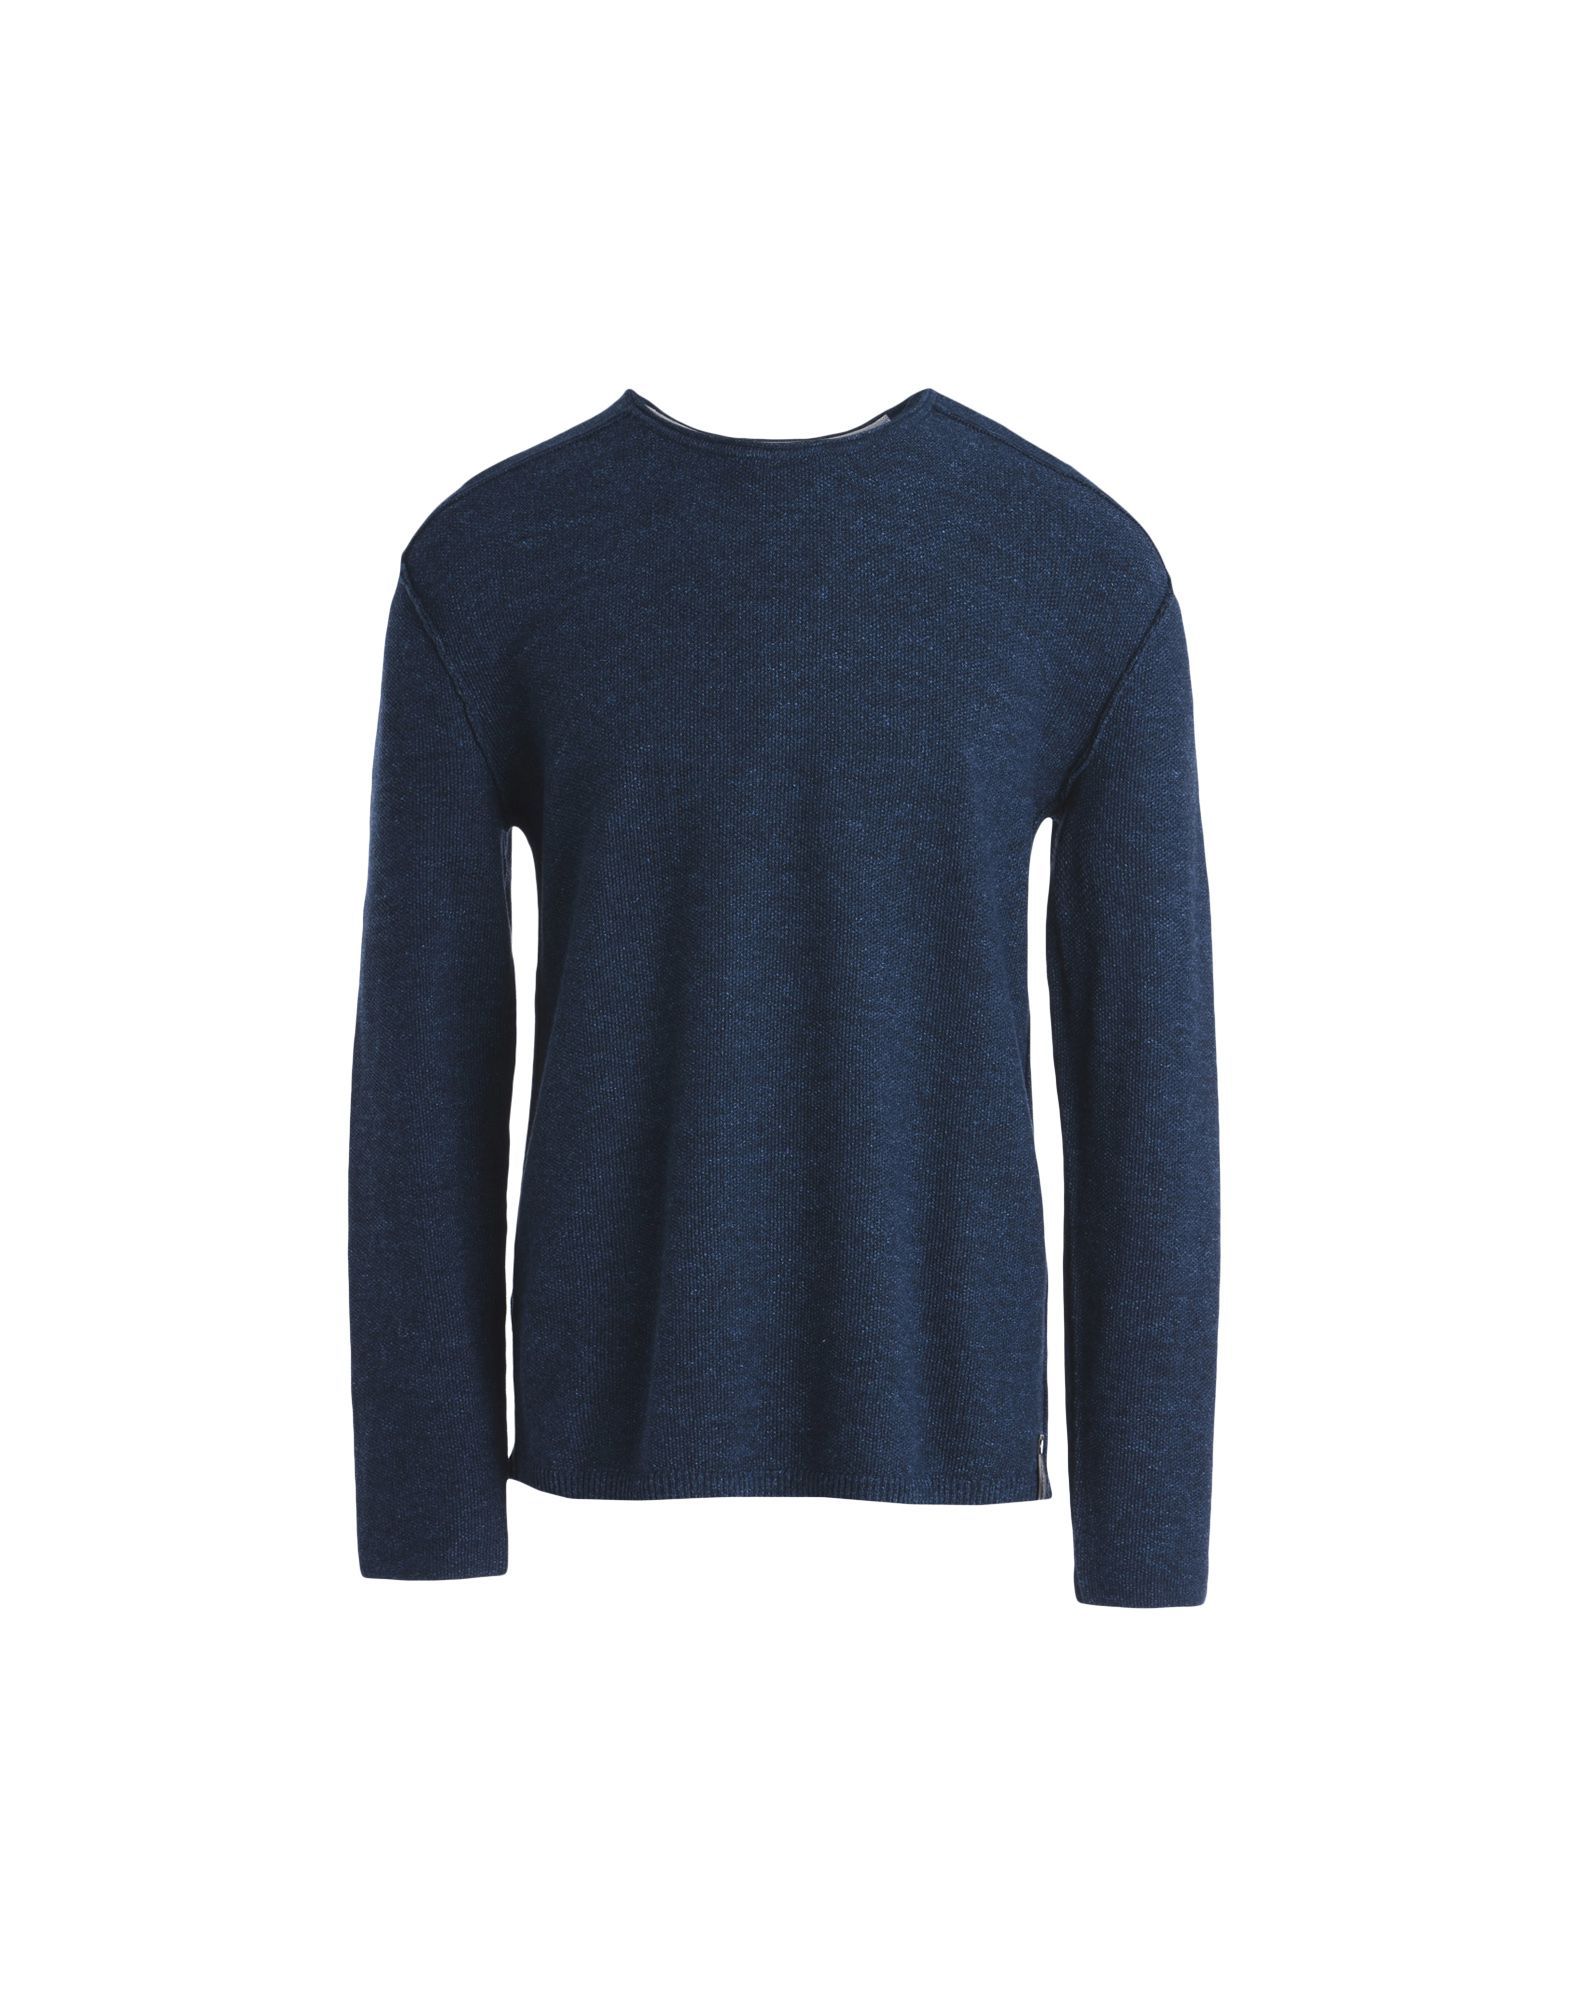 CALVIN KLEIN JEANS Свитер свитер calvin klein jeans calvin klein jeans ca939ewuhm46